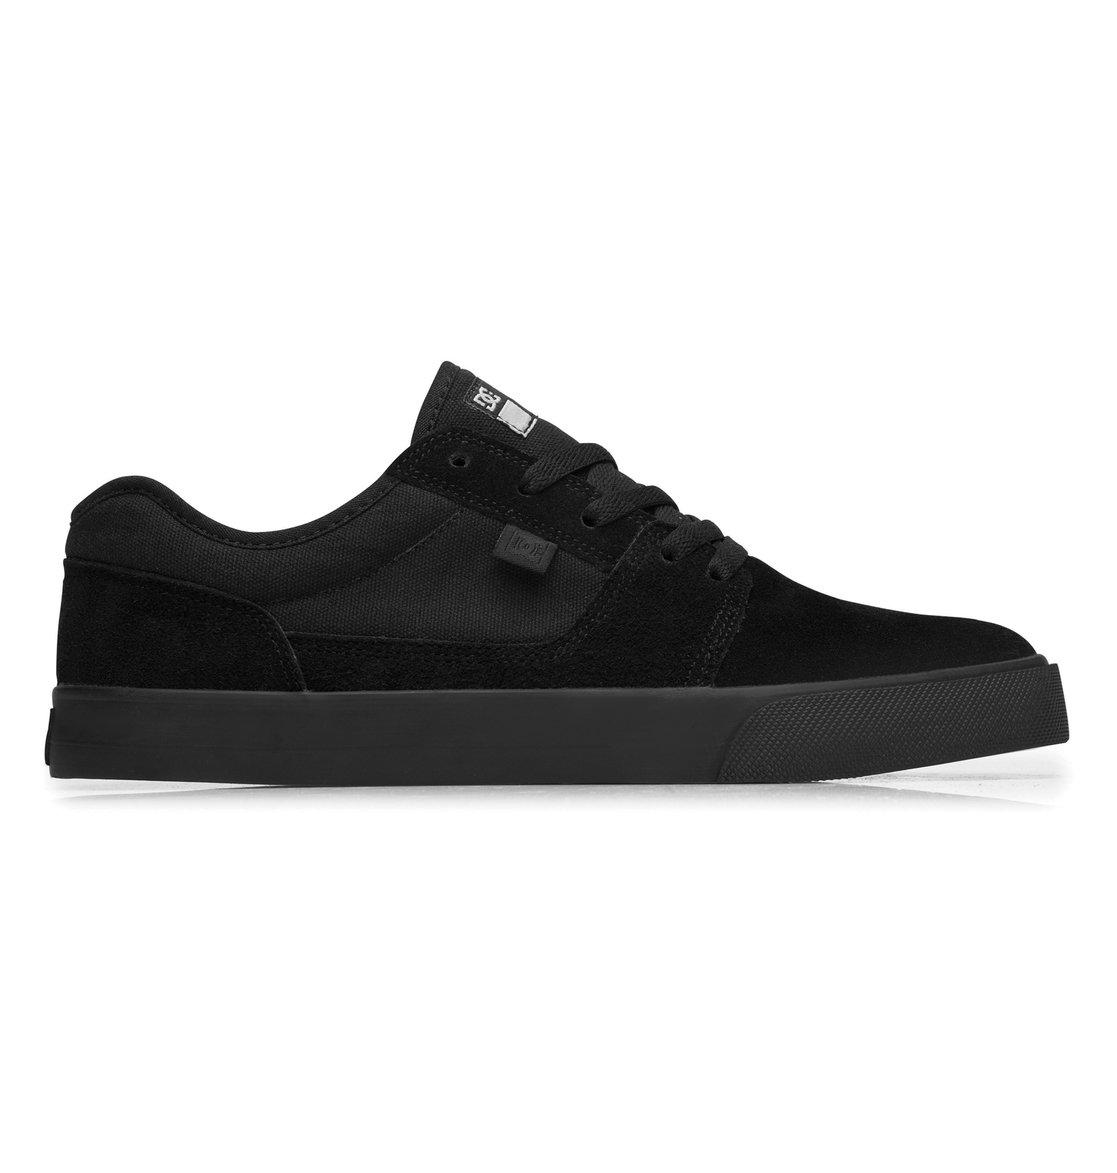 DC para Hombre Tonik Zapatillas de Skate, Negro (Negro/Negro), 9